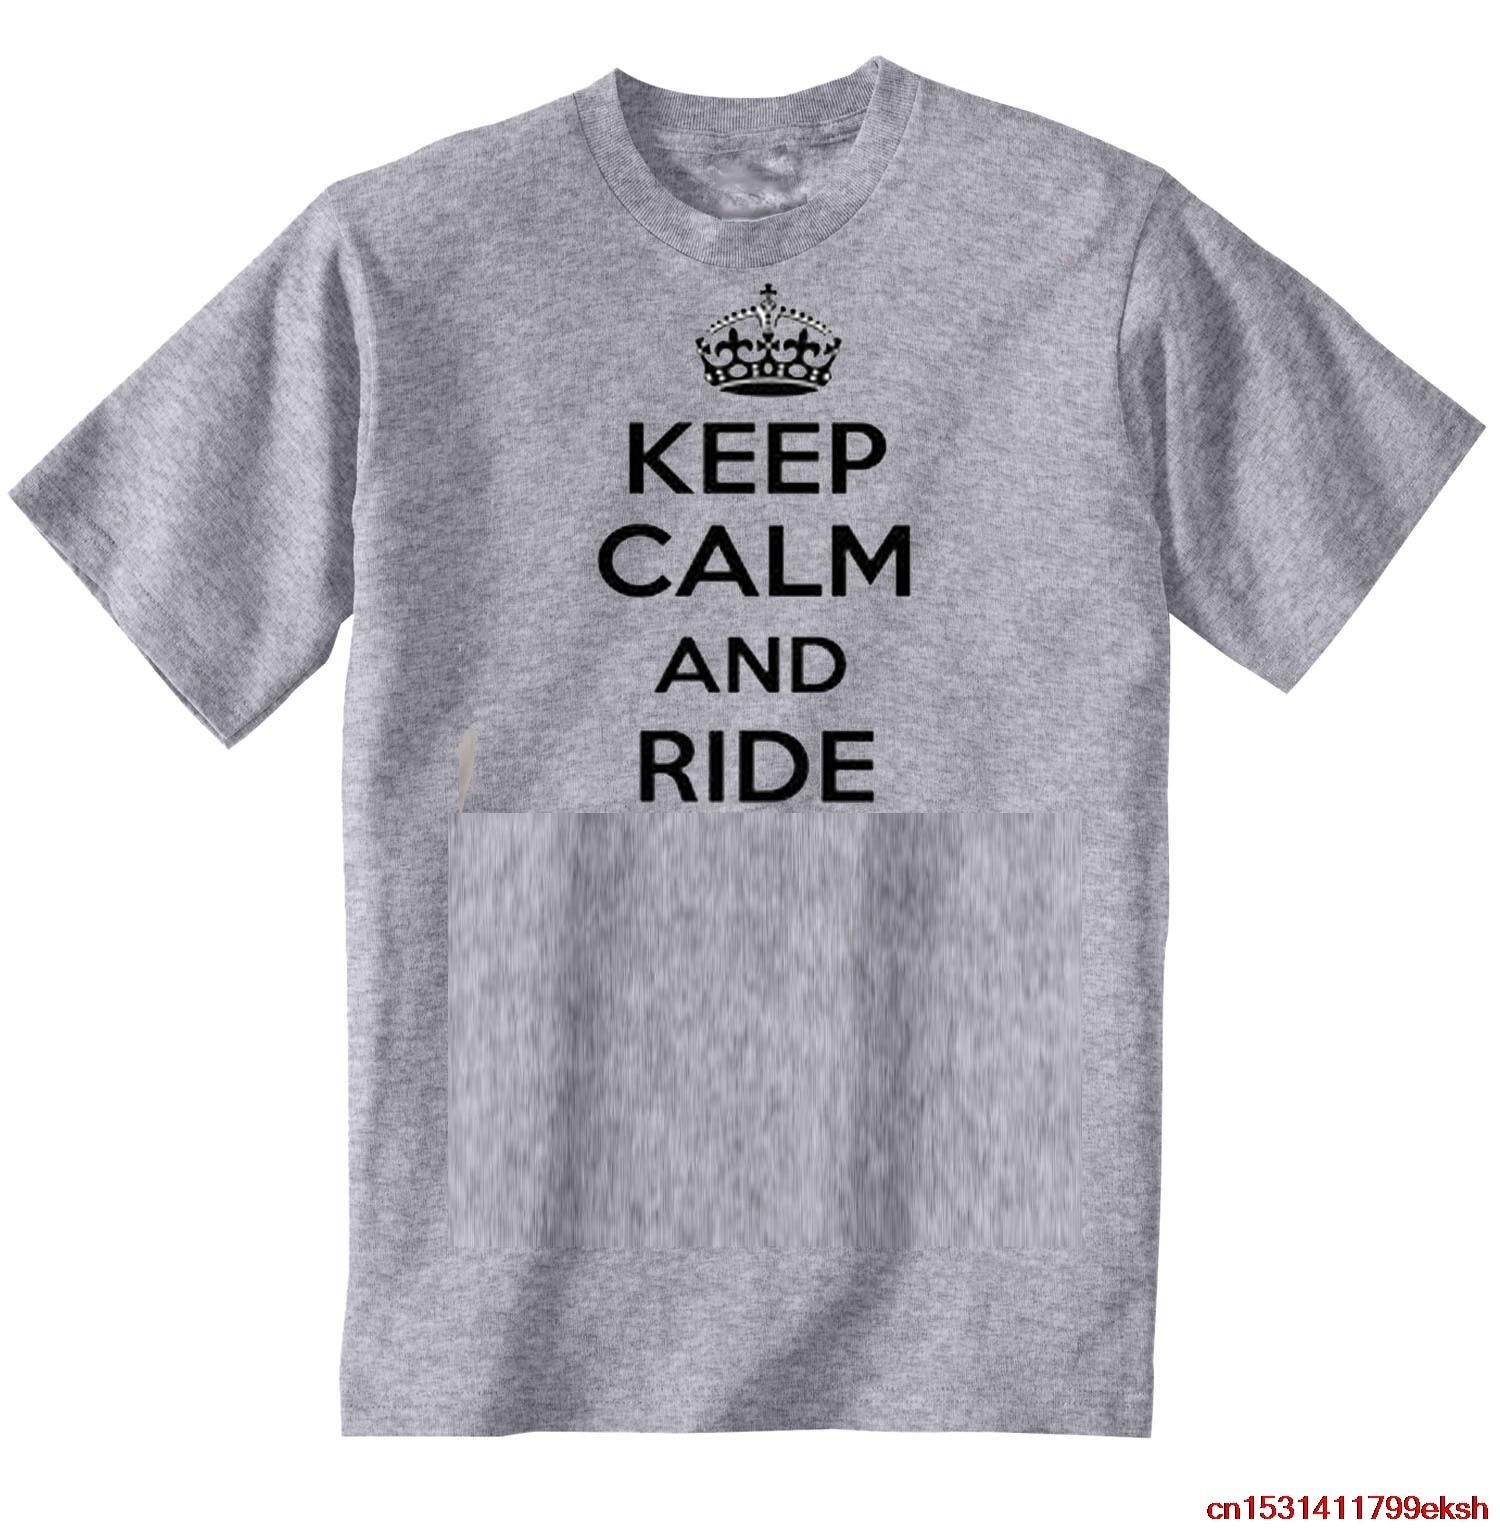 MOTO GUZZI CAFE RACER KEEP CALM-Nueva camiseta gris gráfica increíble S-M-L-XL-XXL